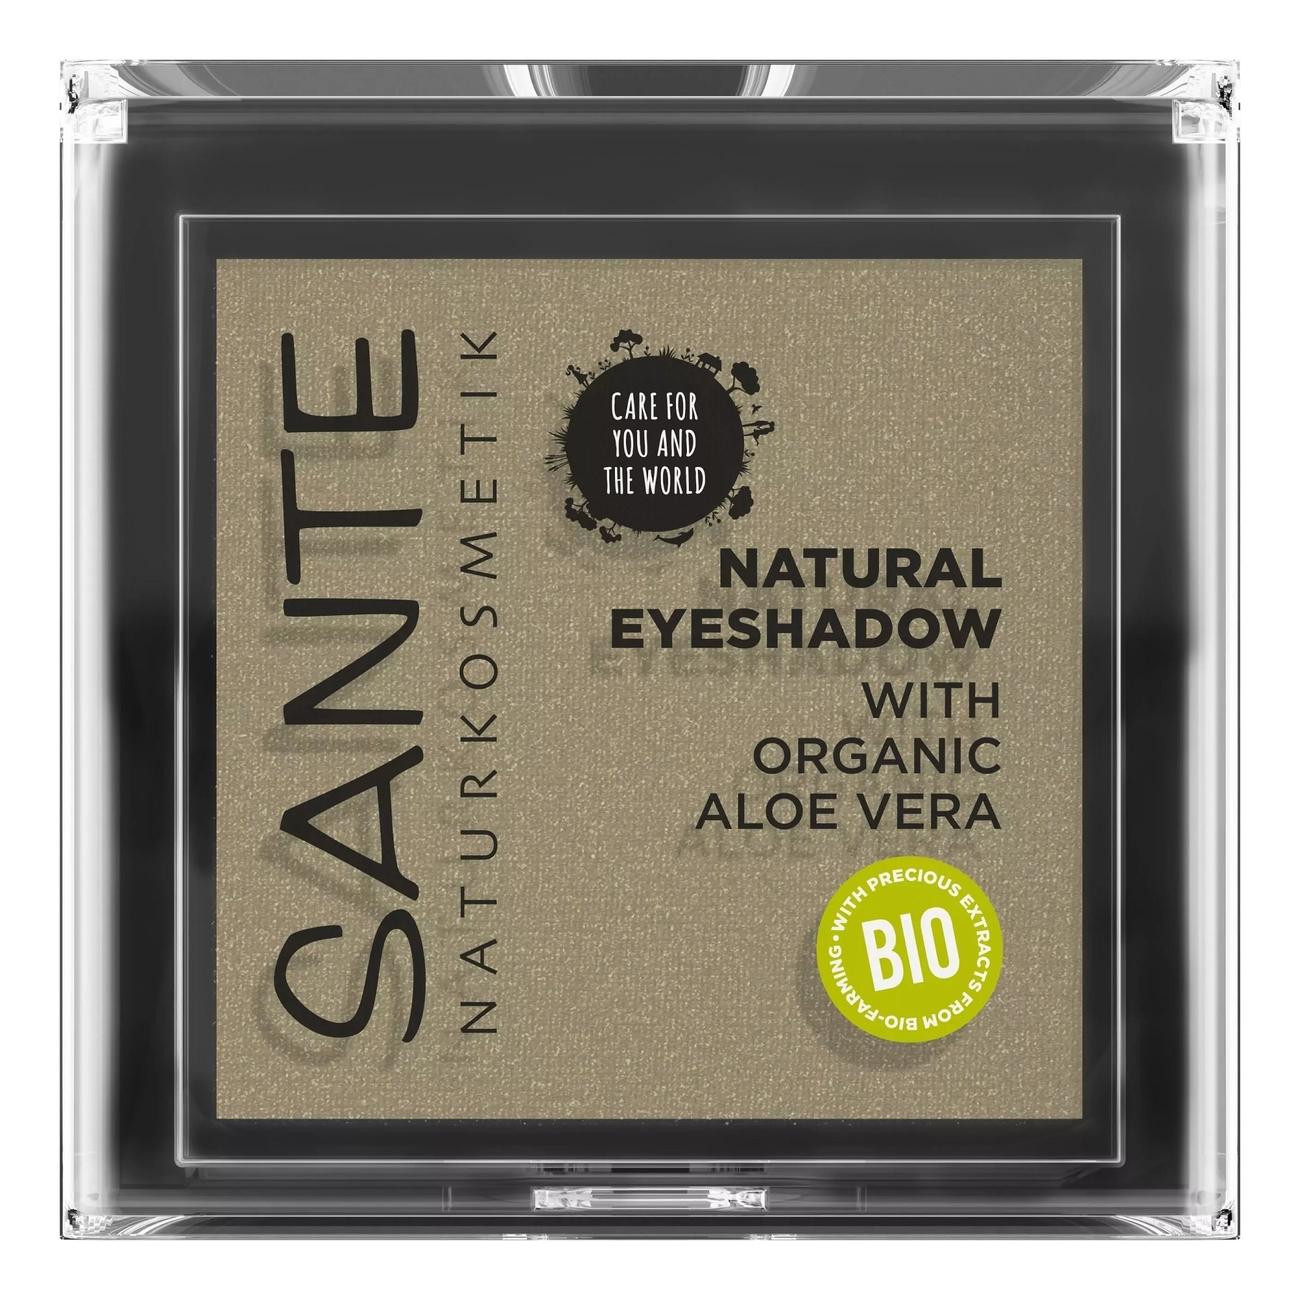 Купить Тени для век Natural Eyeshadow 2г: 04 Tawny Taupe, Sante